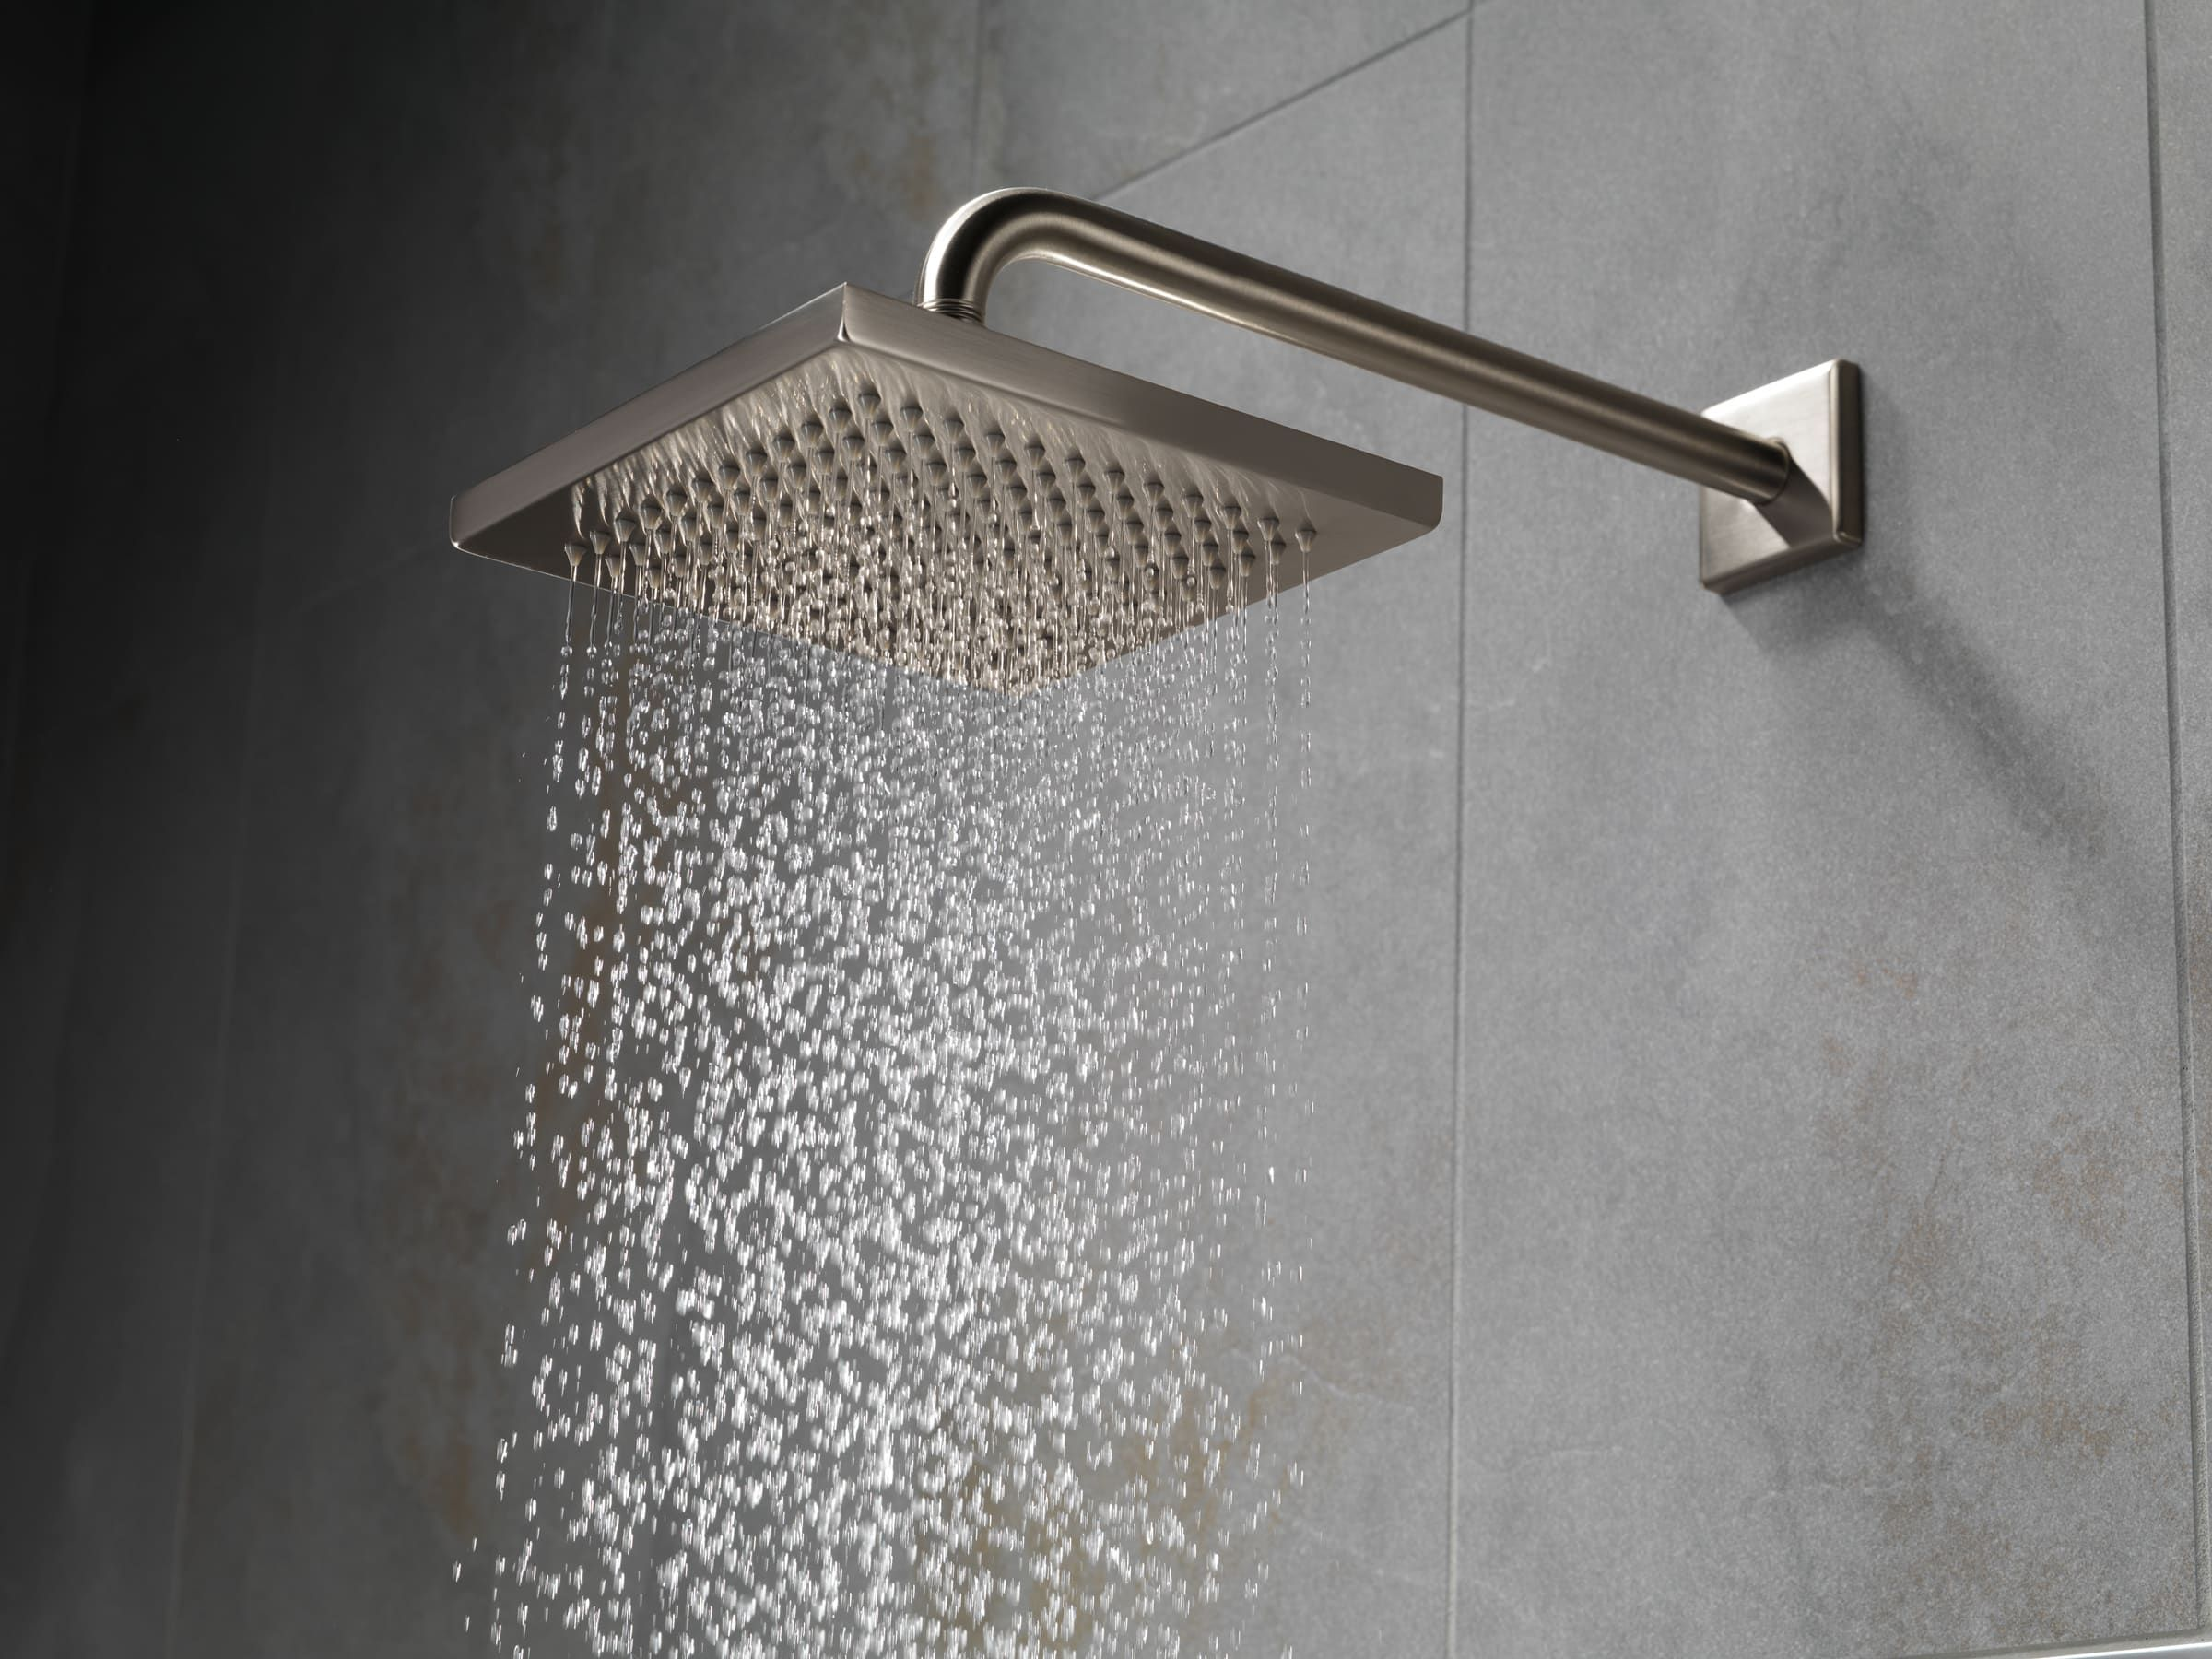 How To Detect A Shower Leak Behind The Wall Bathroom Decor Modern Shower Design Chrome Decor